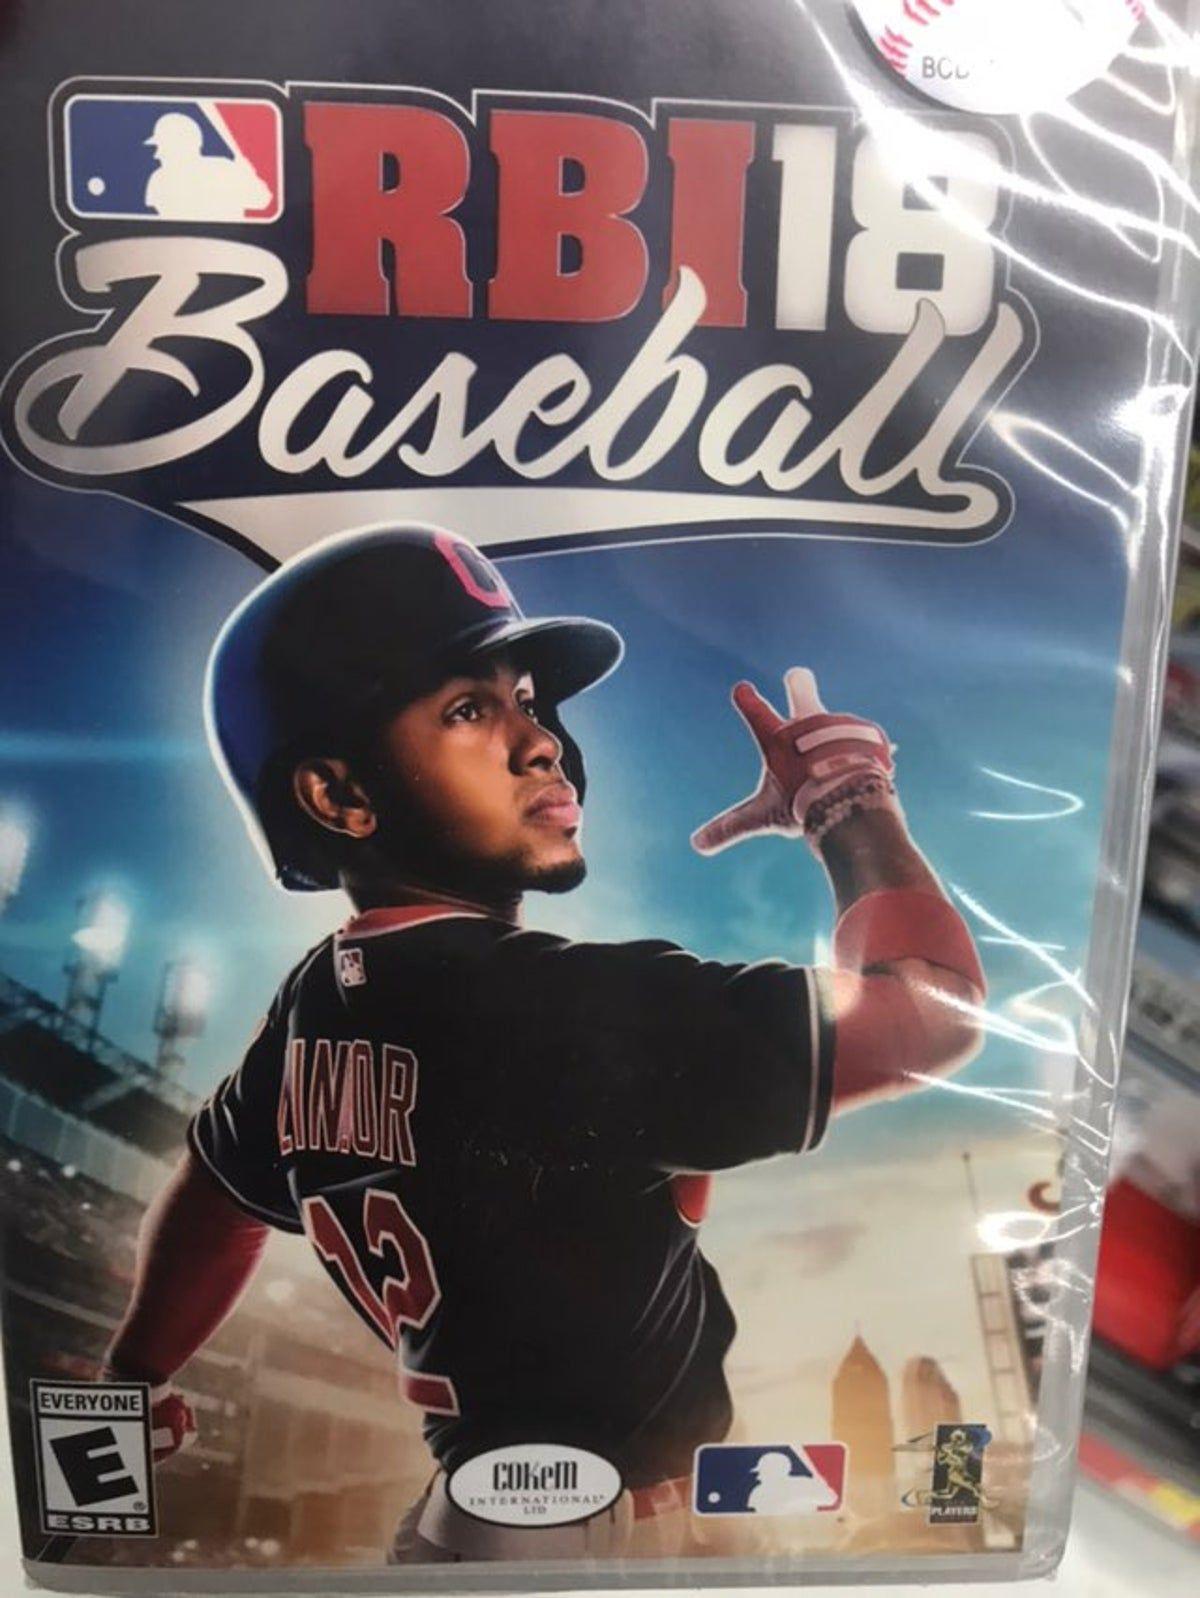 Rbi Baseball Nintendo Switch Video 2018 in 2020 Switch